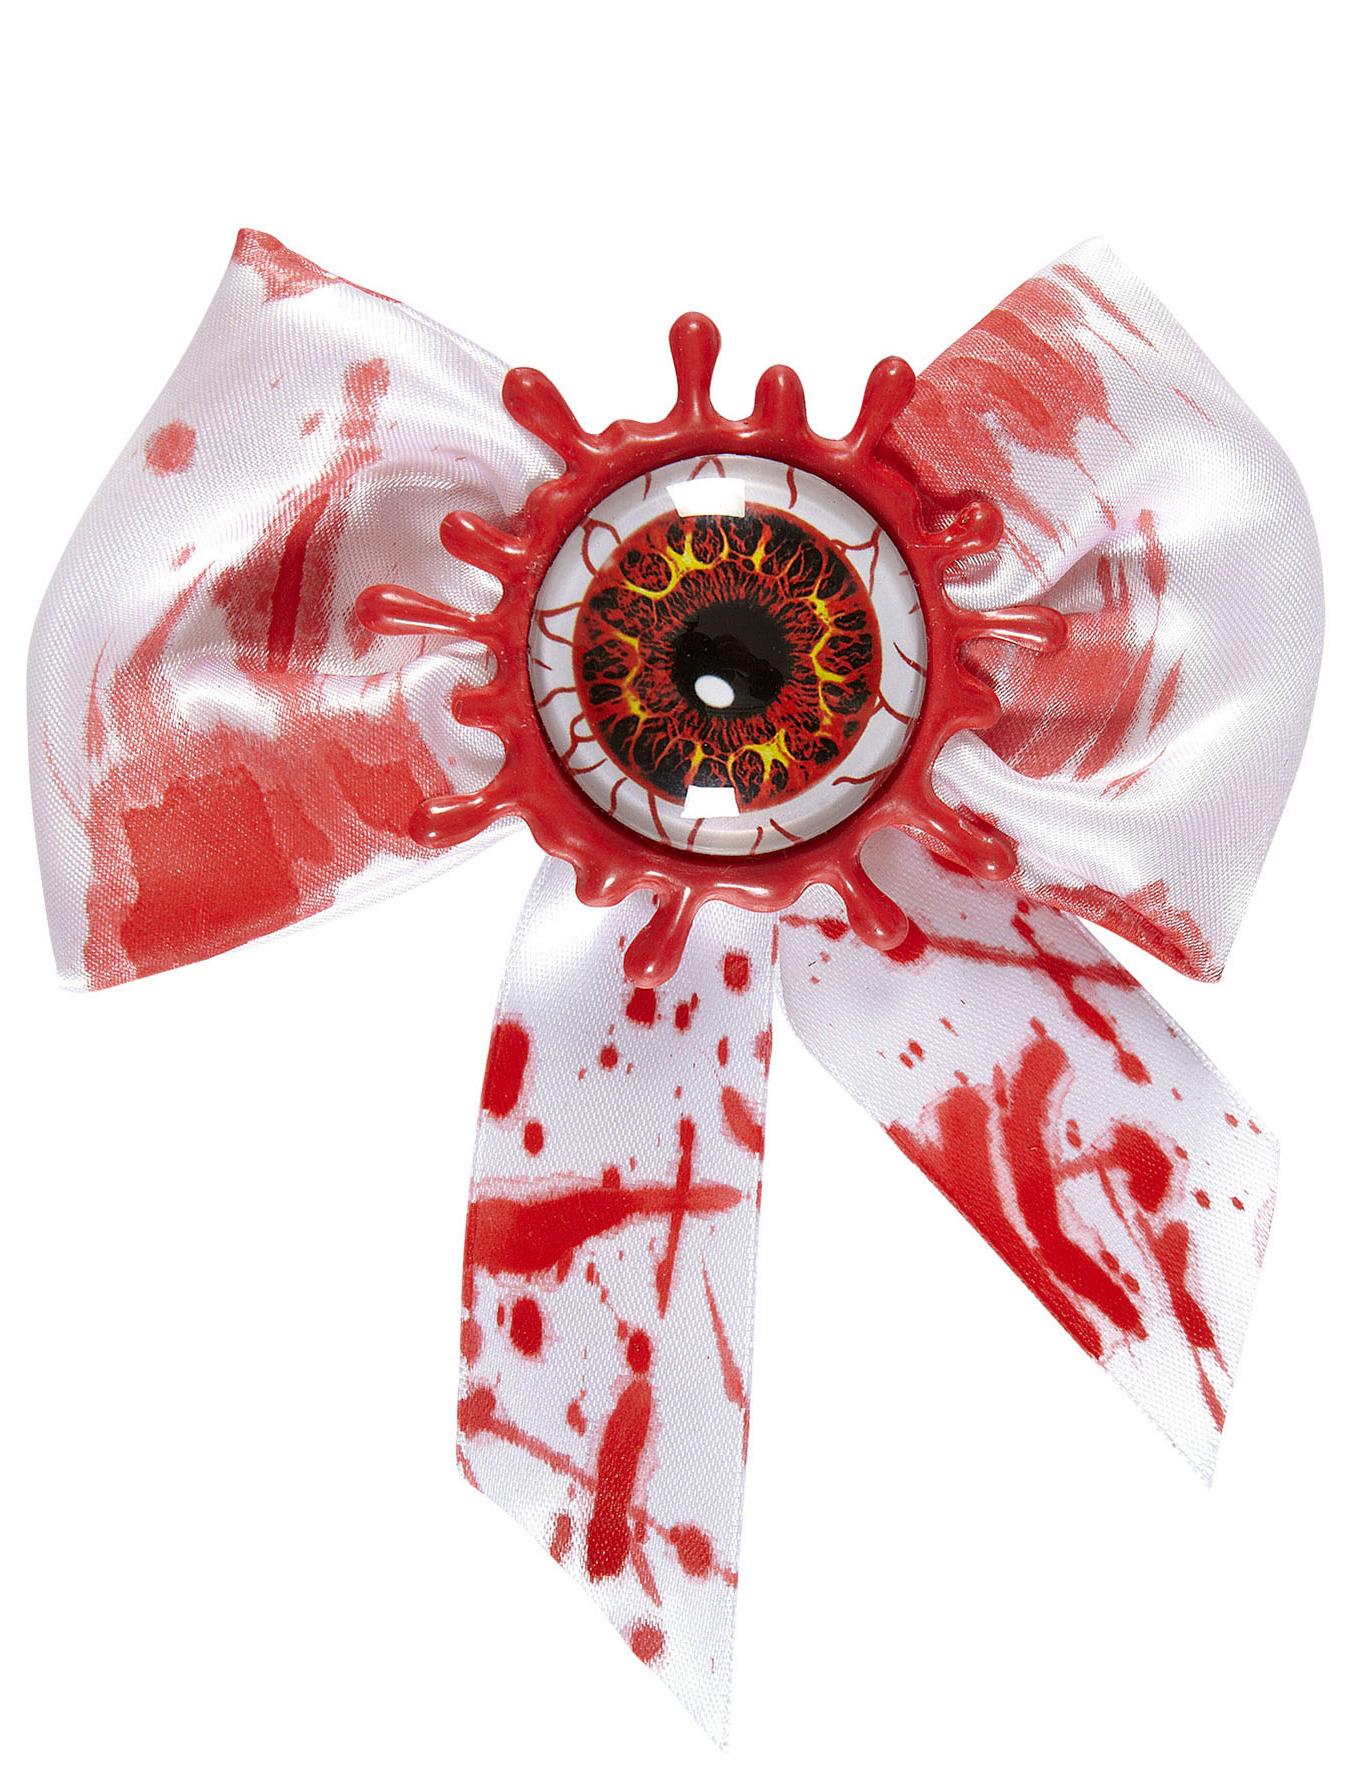 Blutiges Auge